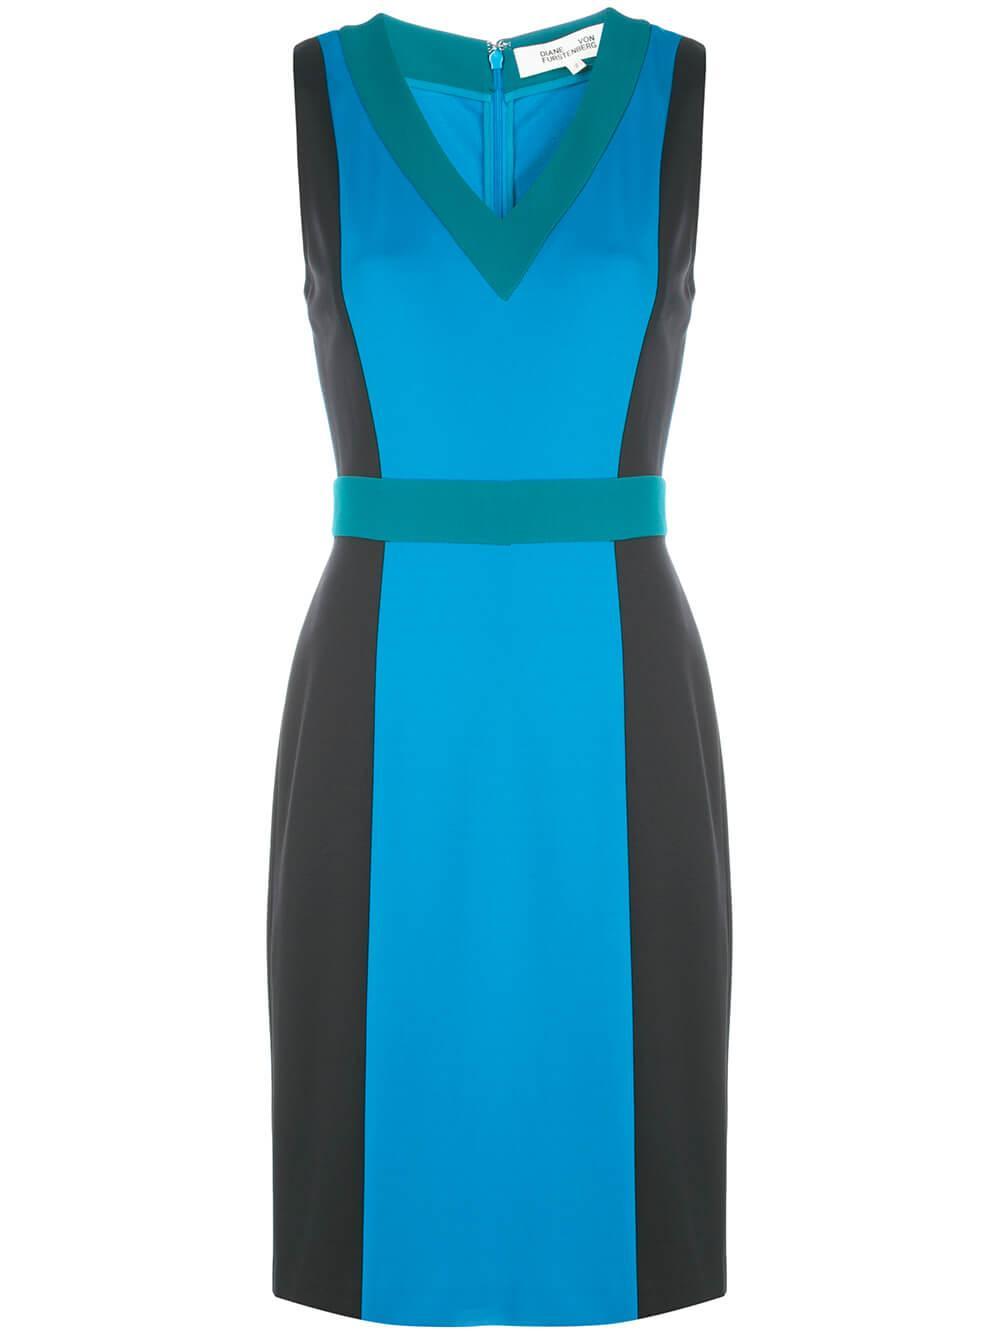 Arbor Sleeveless Colorblock Dress Item # 13723DVF